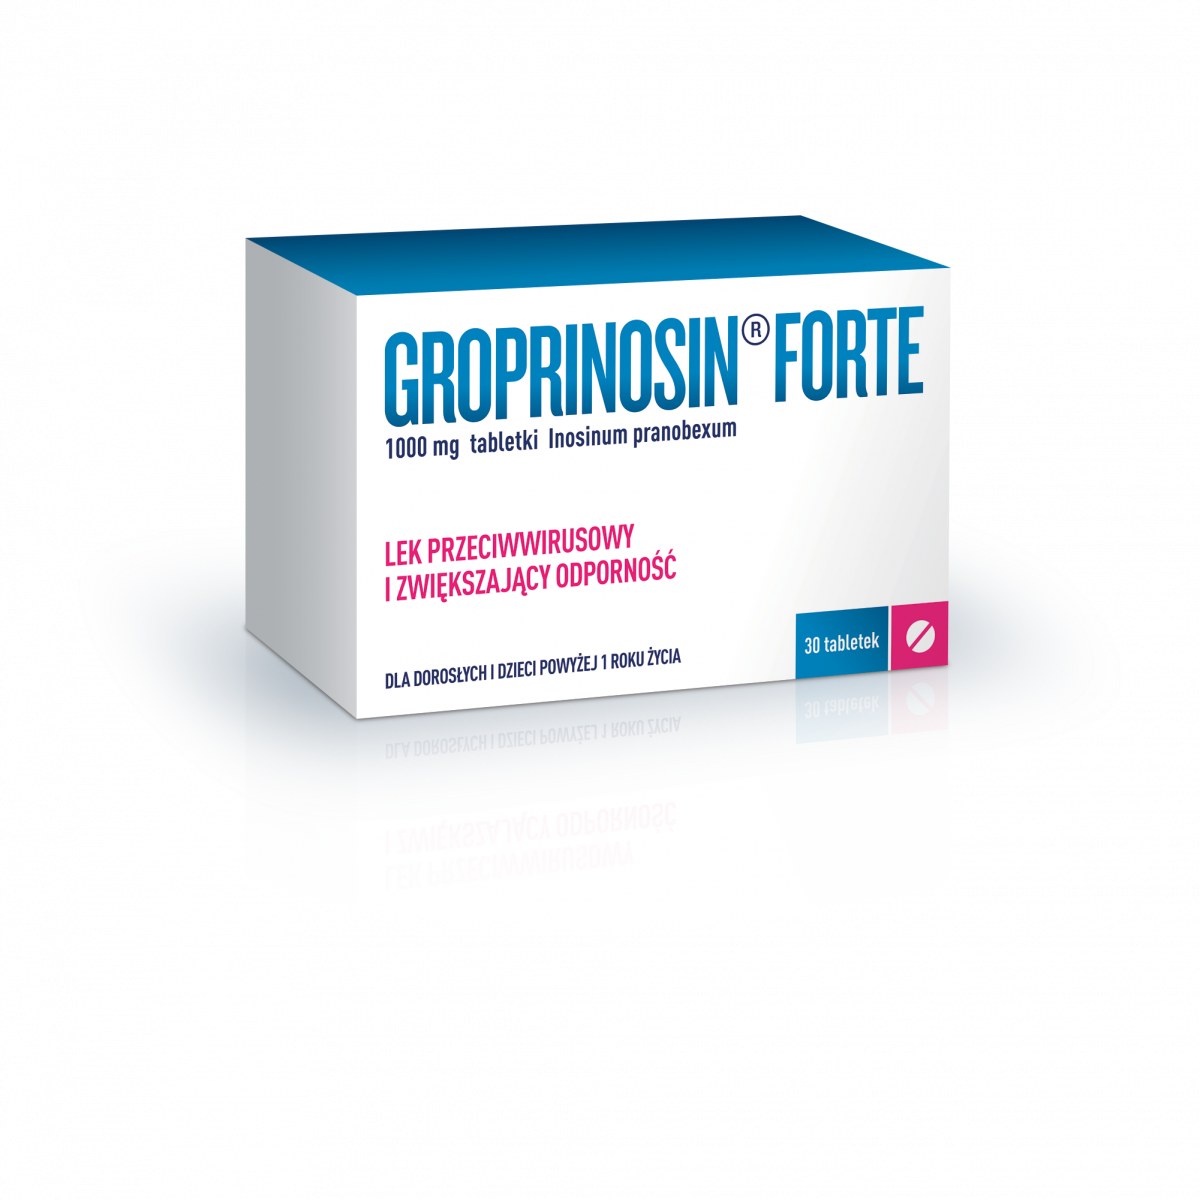 Groprinosin_Forte_tbl_x30_